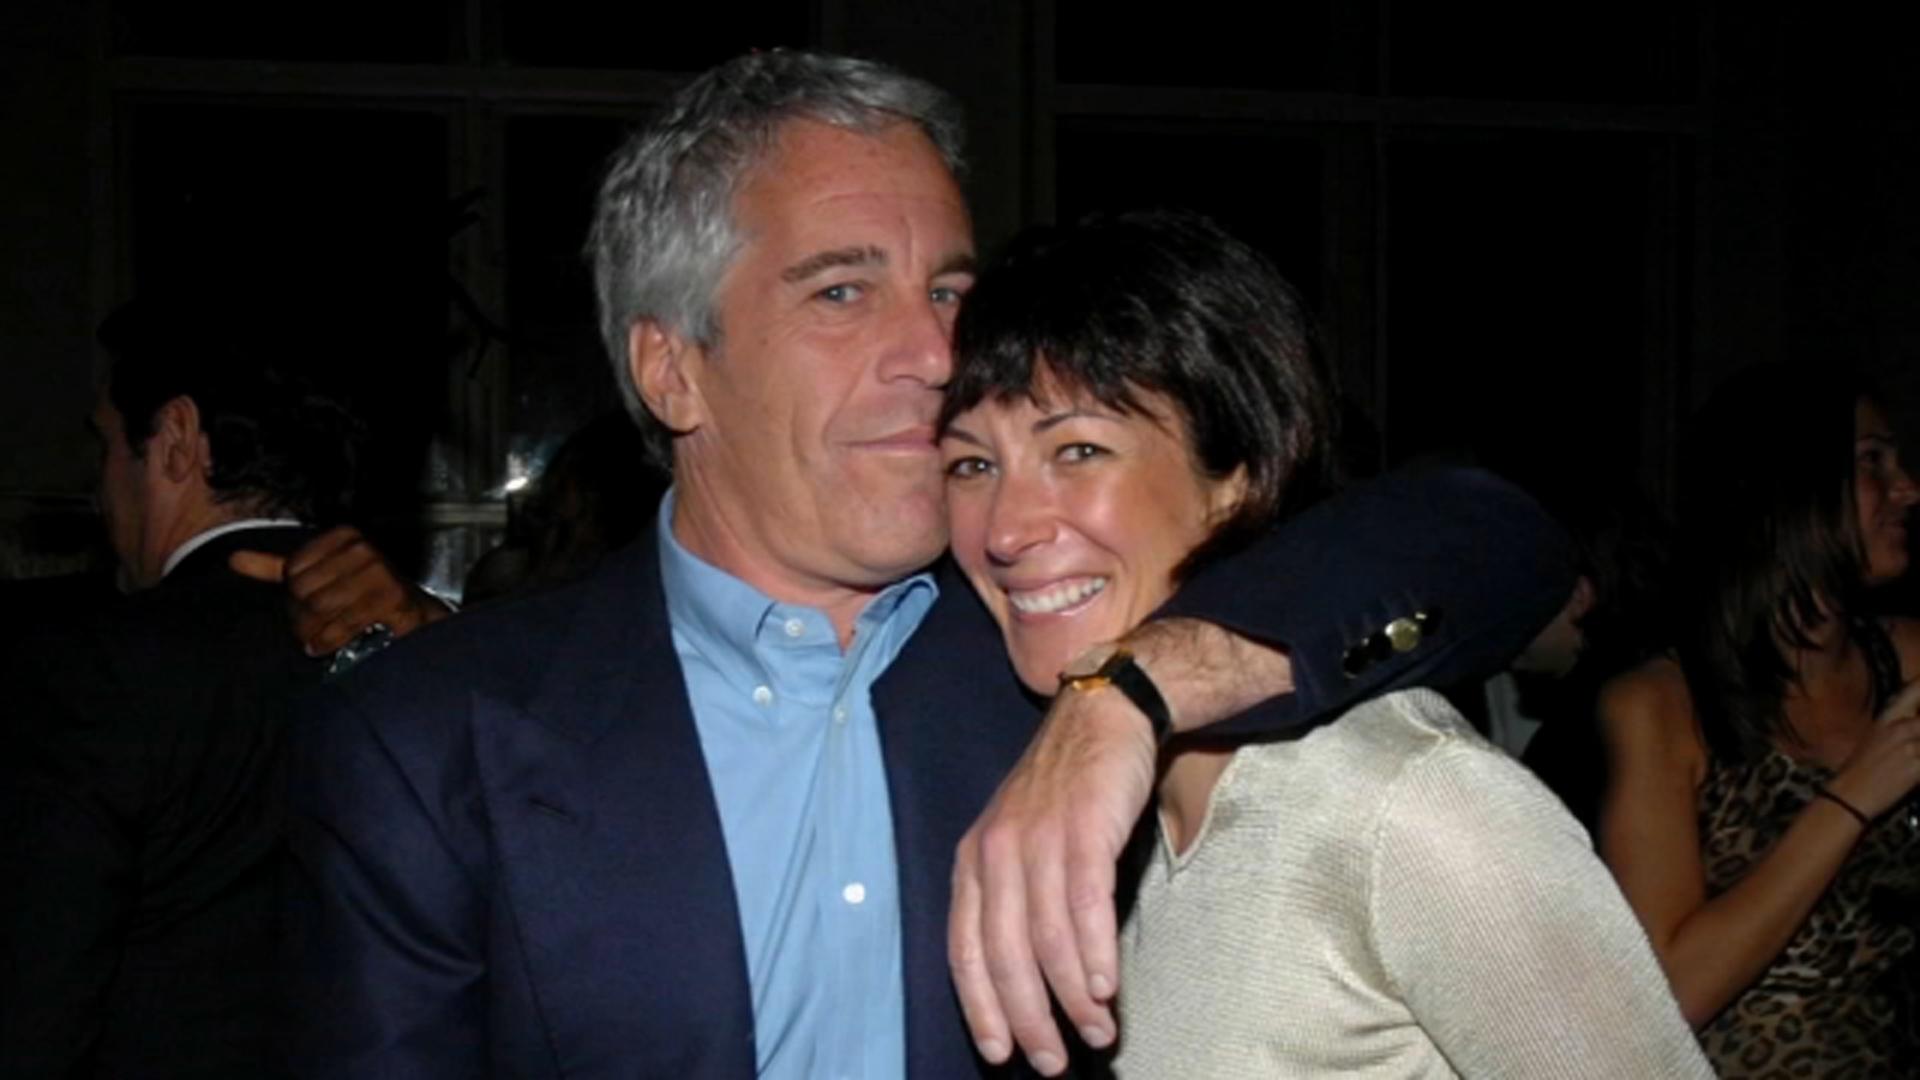 Alleged Jeffrey Epstein facilitator Ghislaine Maxwell taken into federal custody